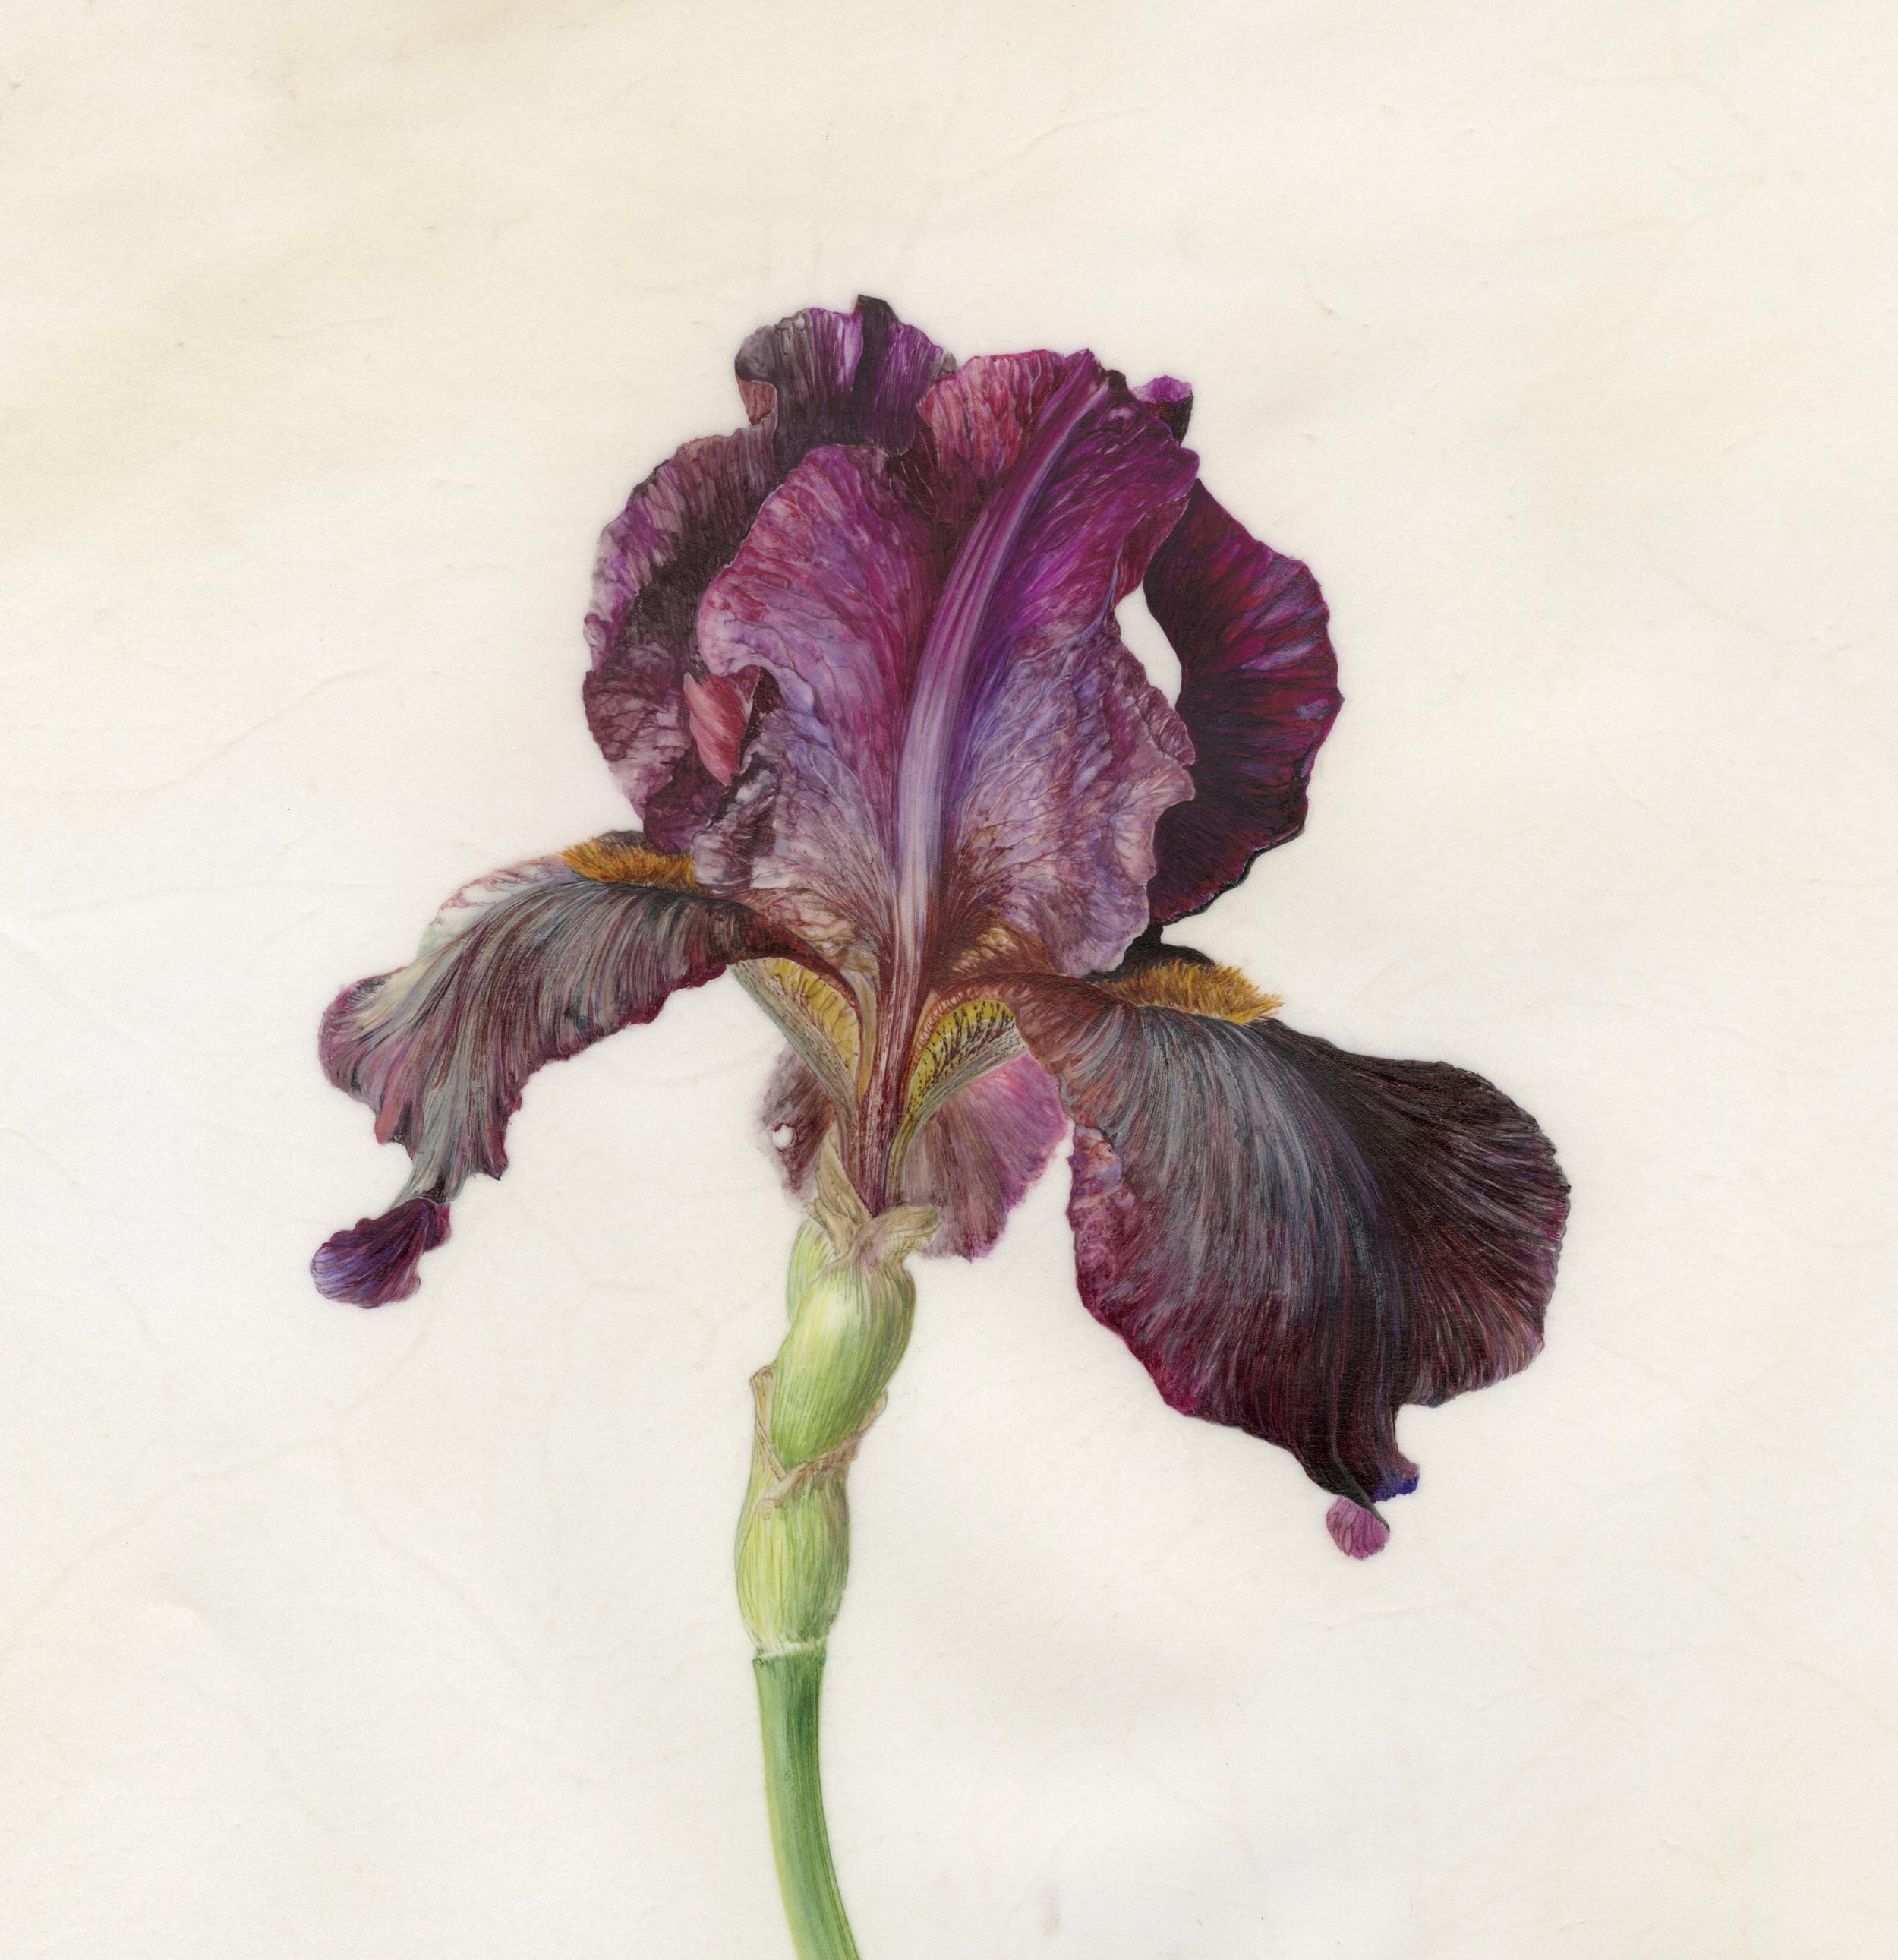 Iris Recogniton II Langport Wren  watercolour on vellum  21 x 21 cm image  SOLD